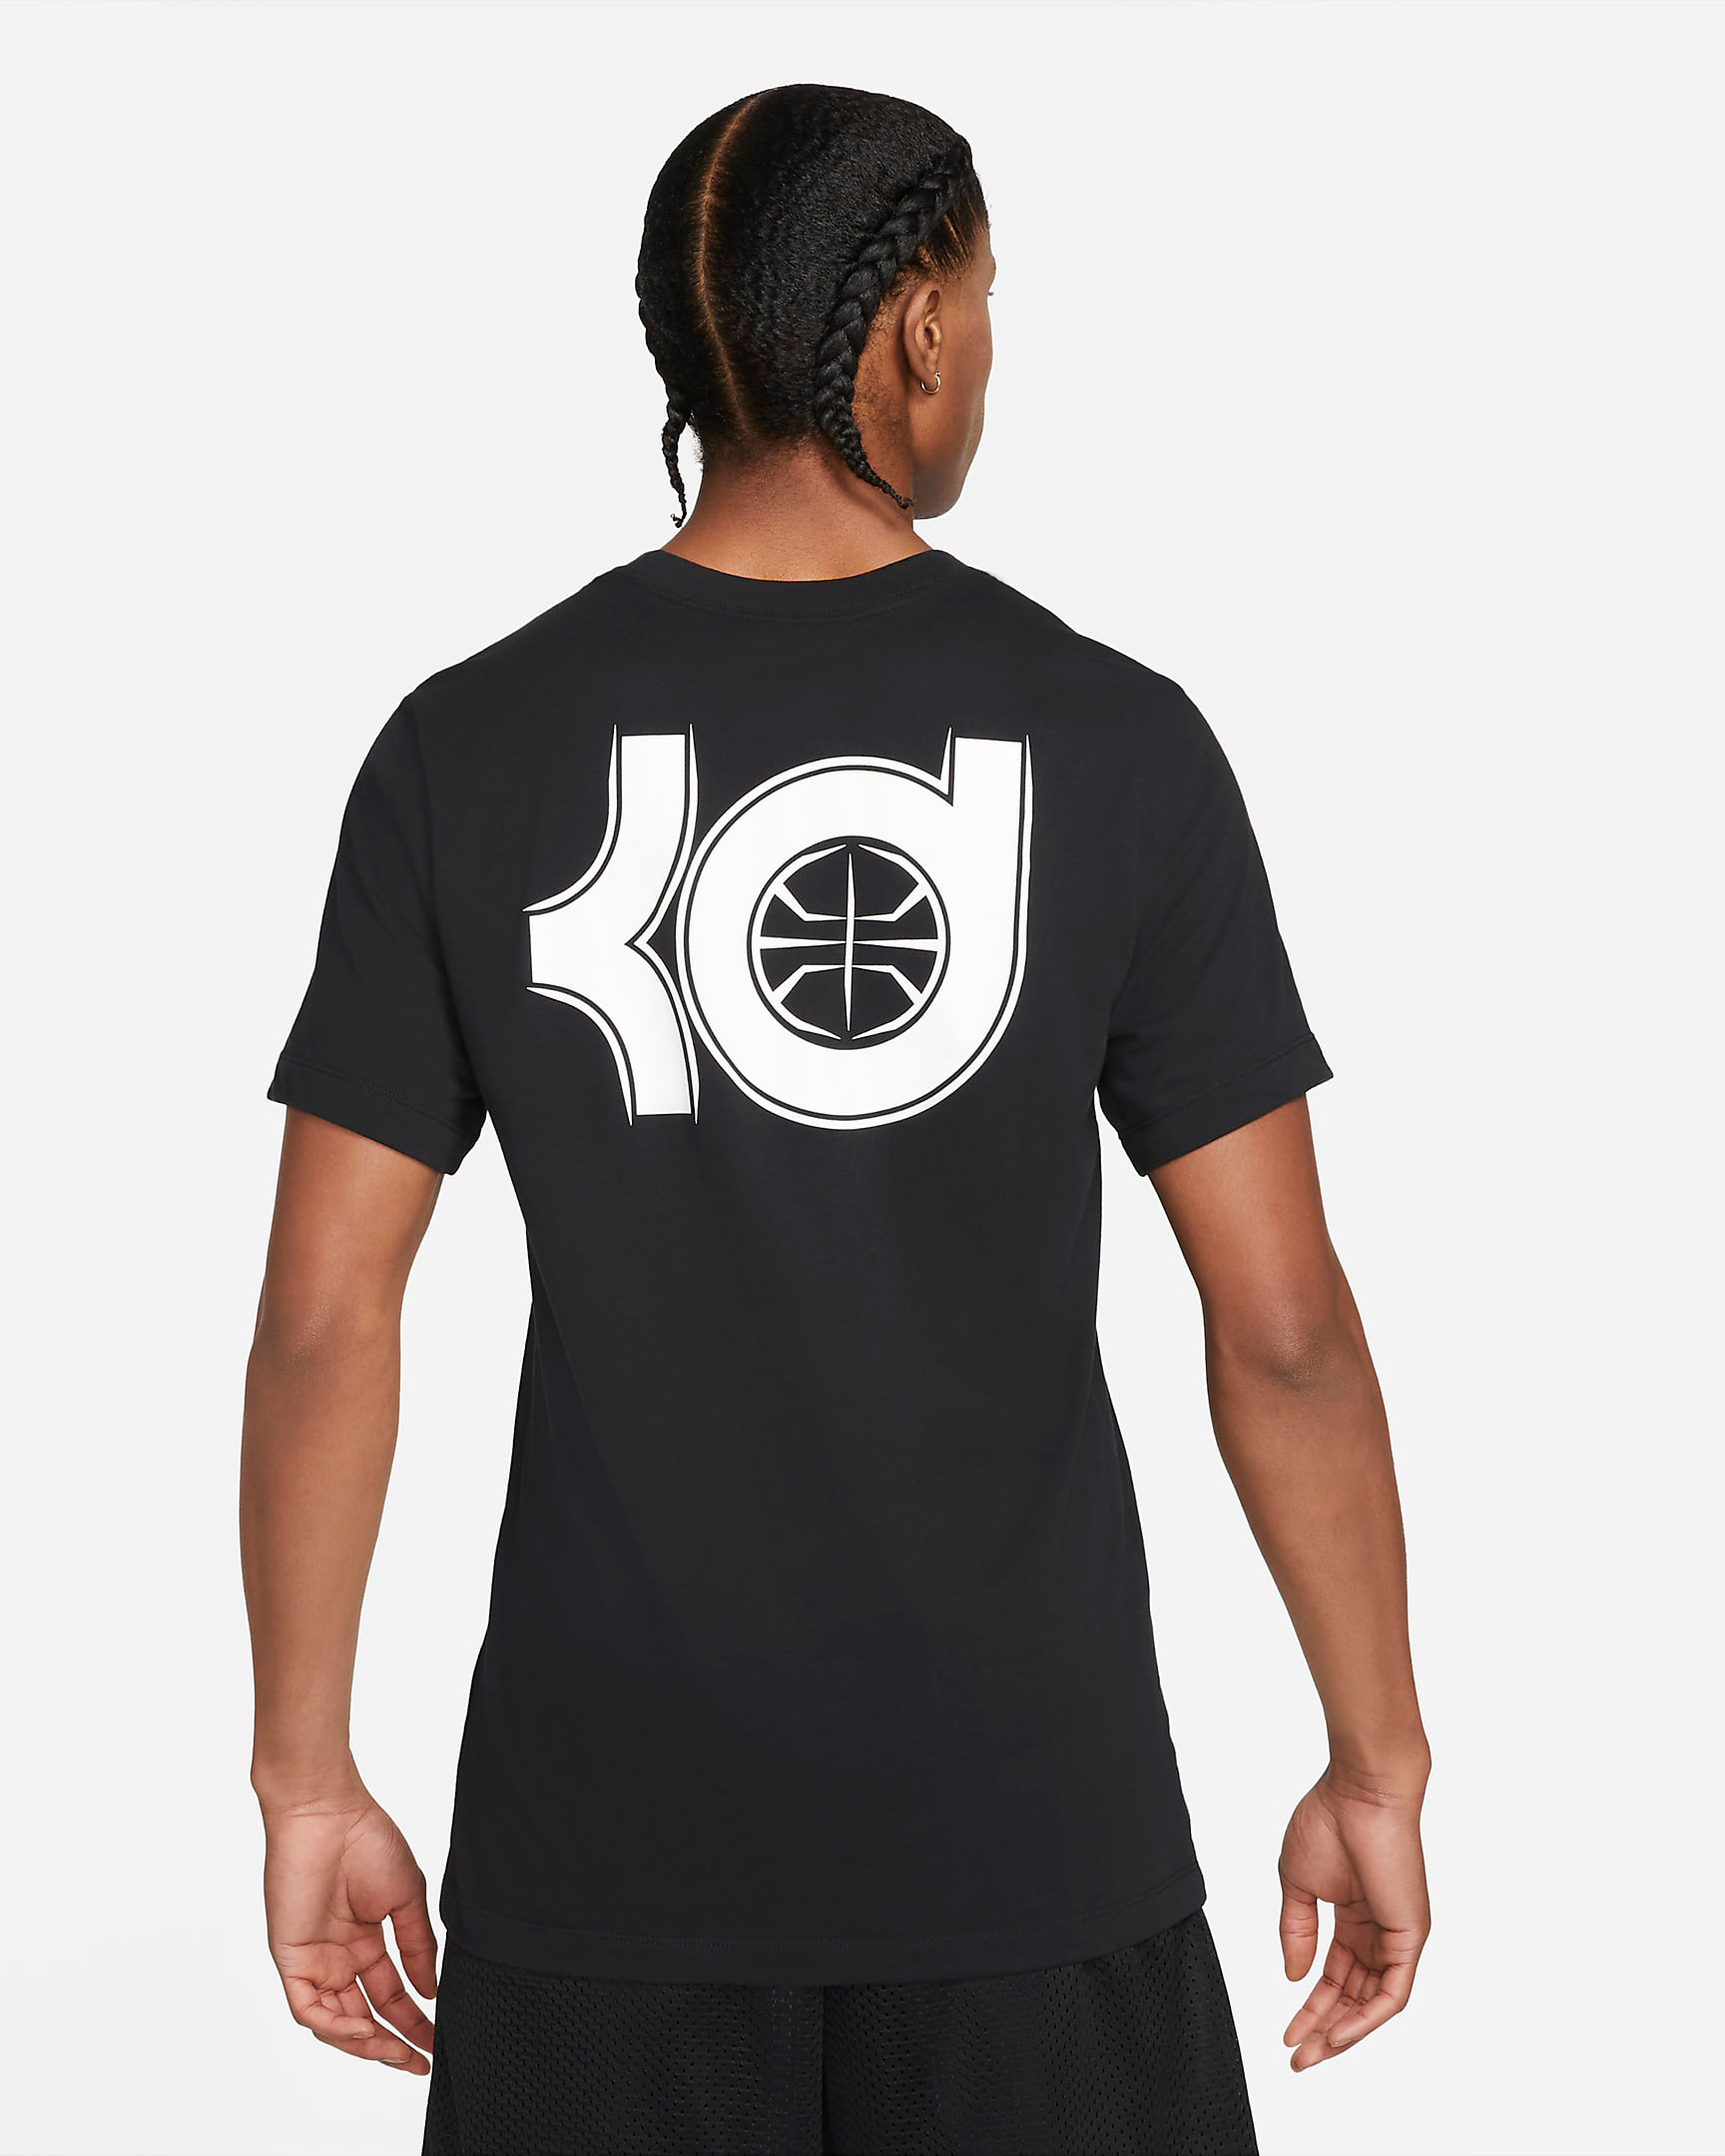 nike-kd-14-shirt-black-white-2